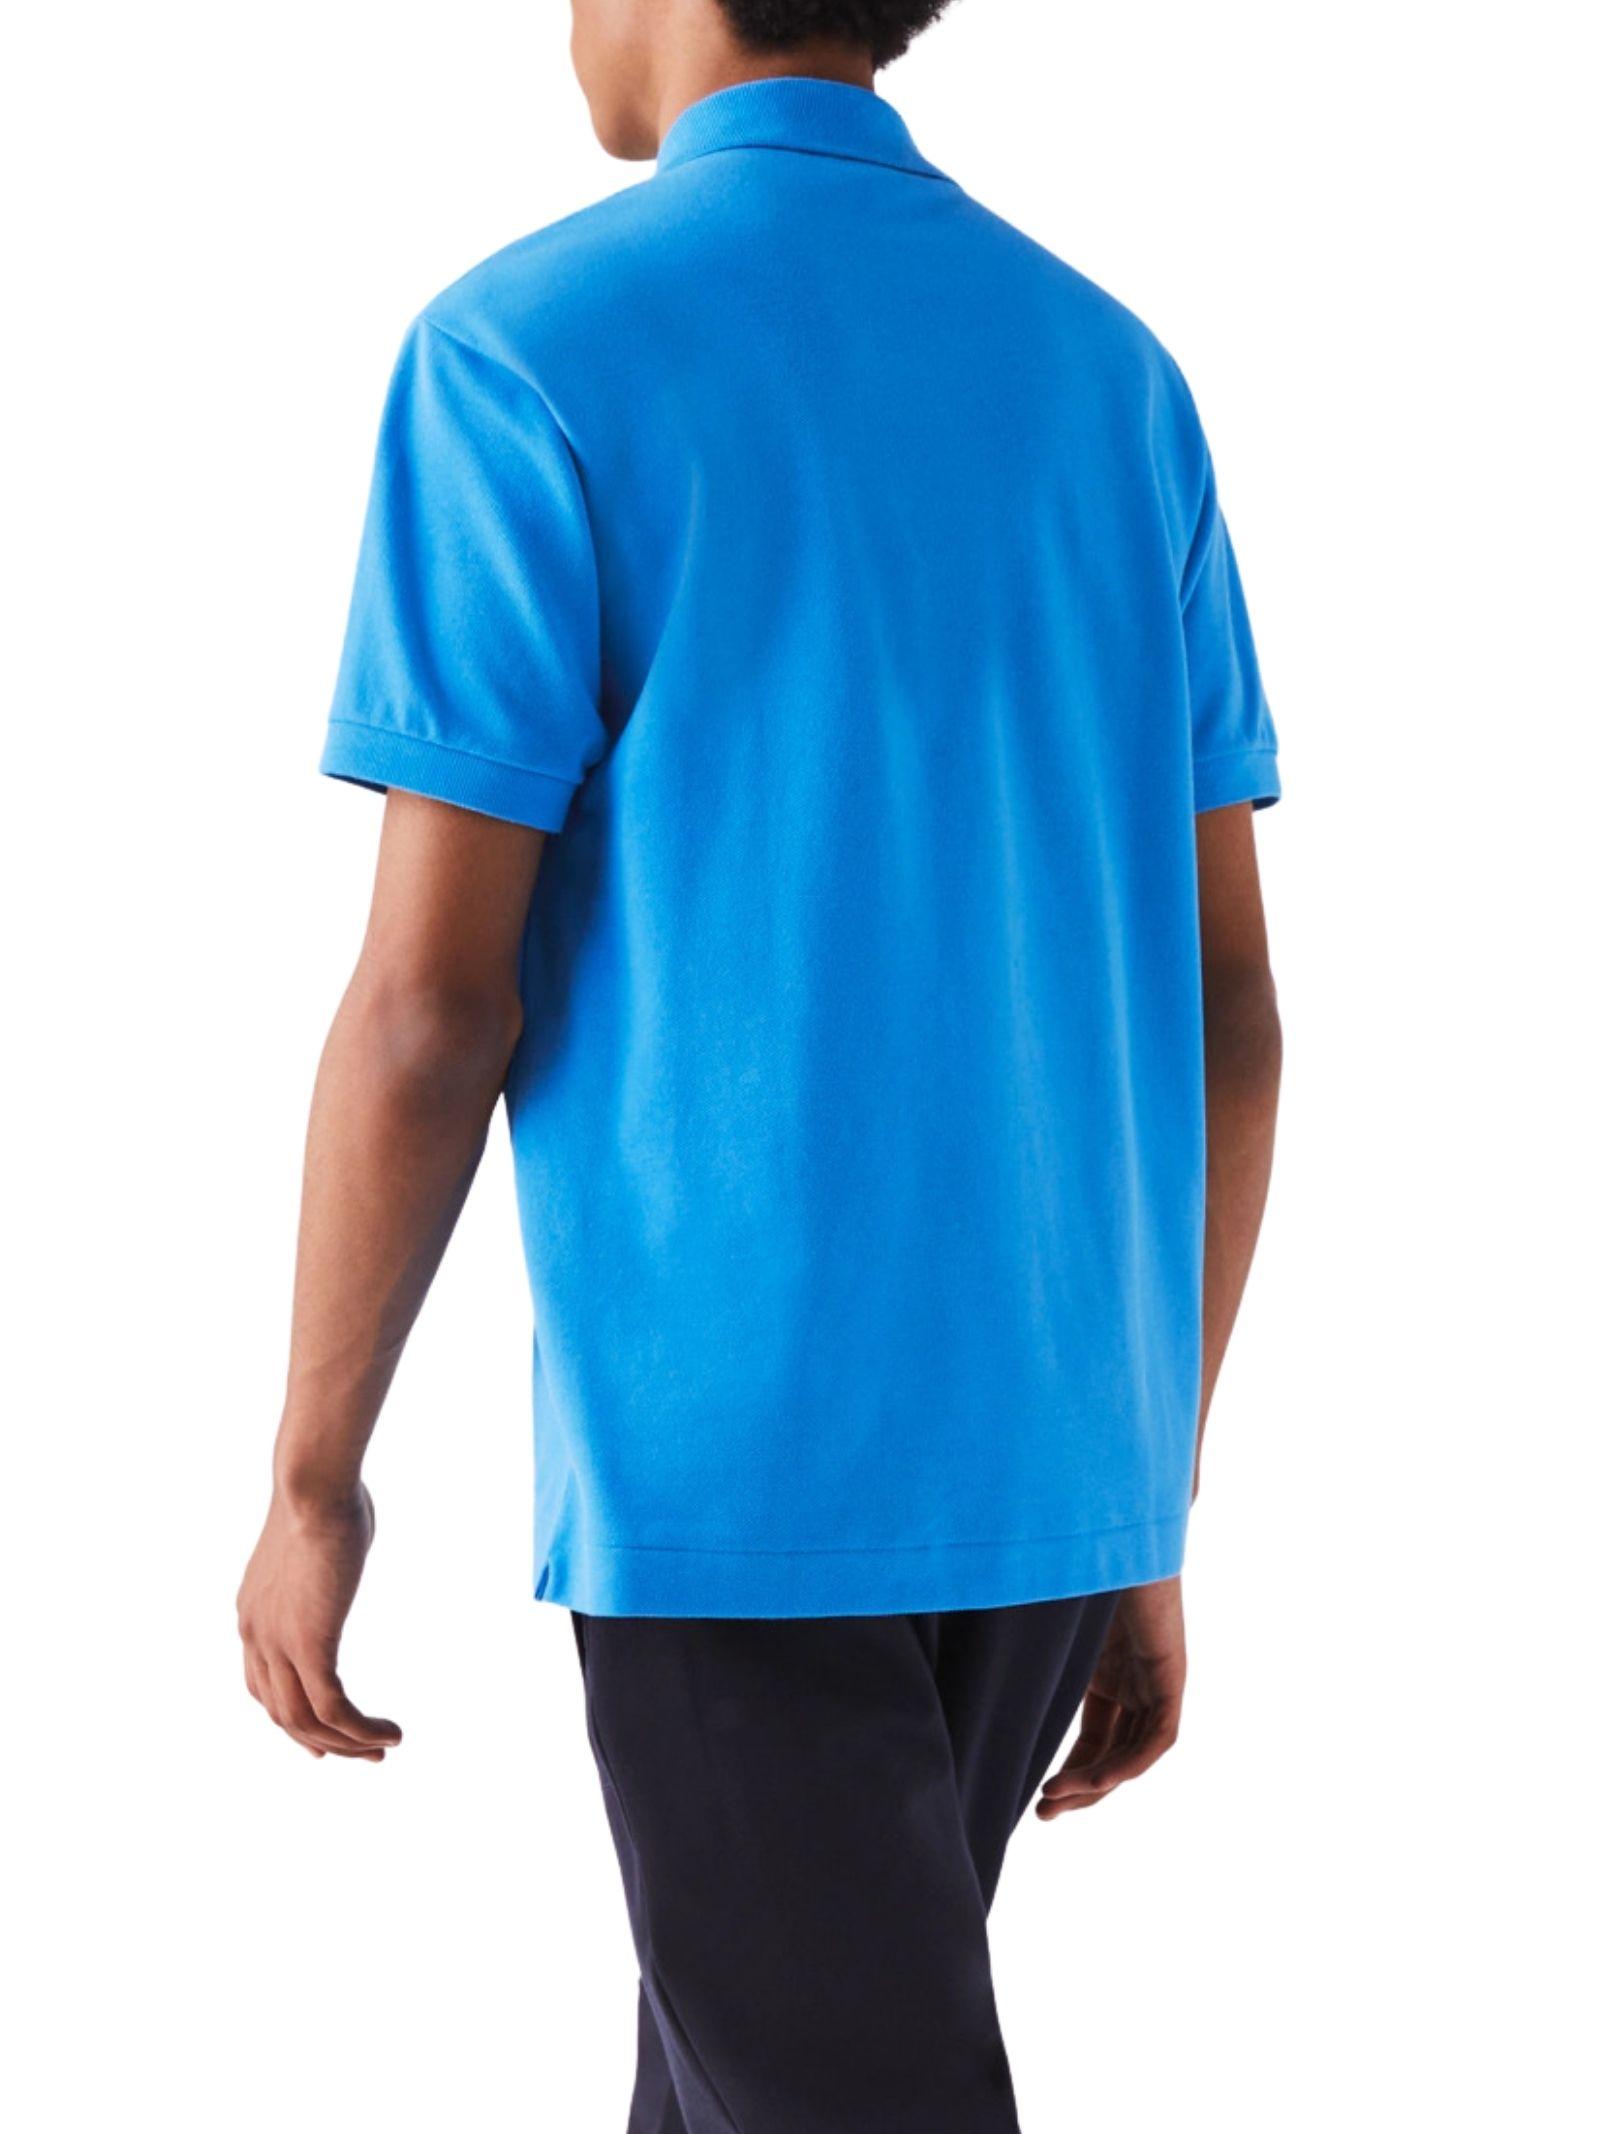 Lacoste L.12.12 polo shirt  LACOSTE | Polo | 1212PTV